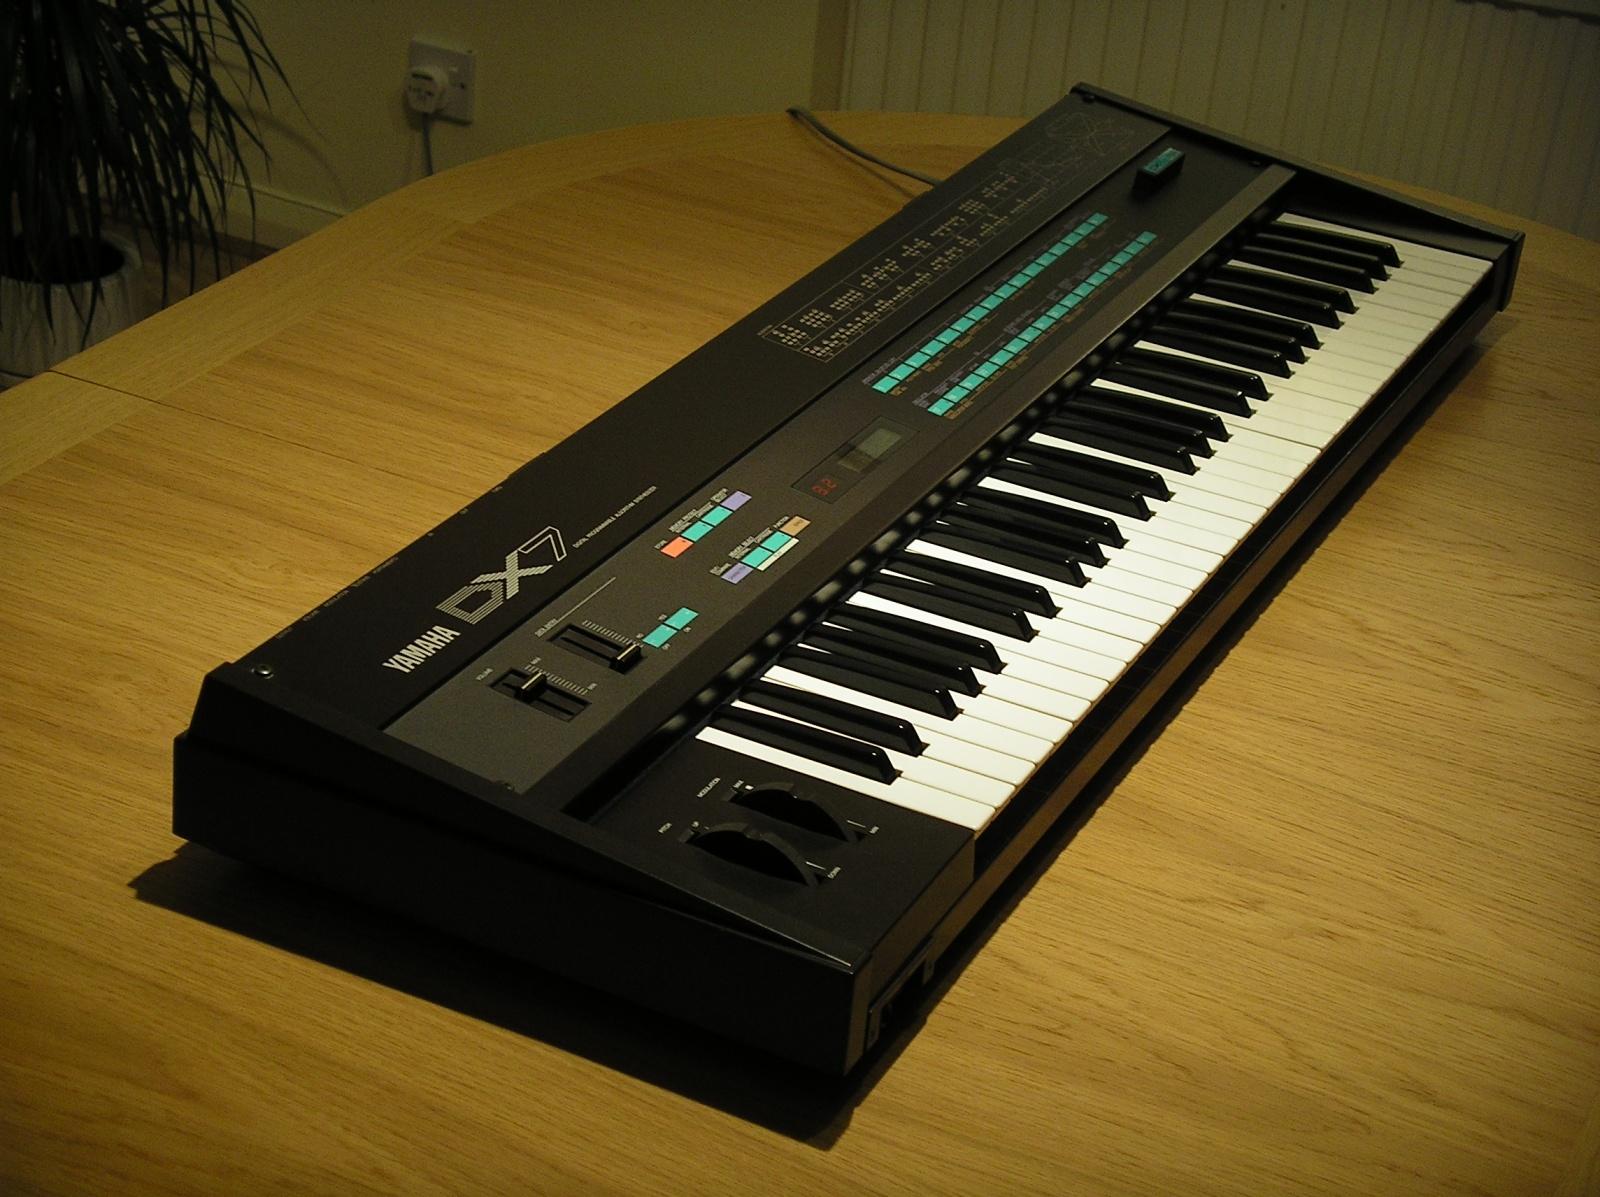 AudioKit и синтезирование звука в iOS-OSX - 10